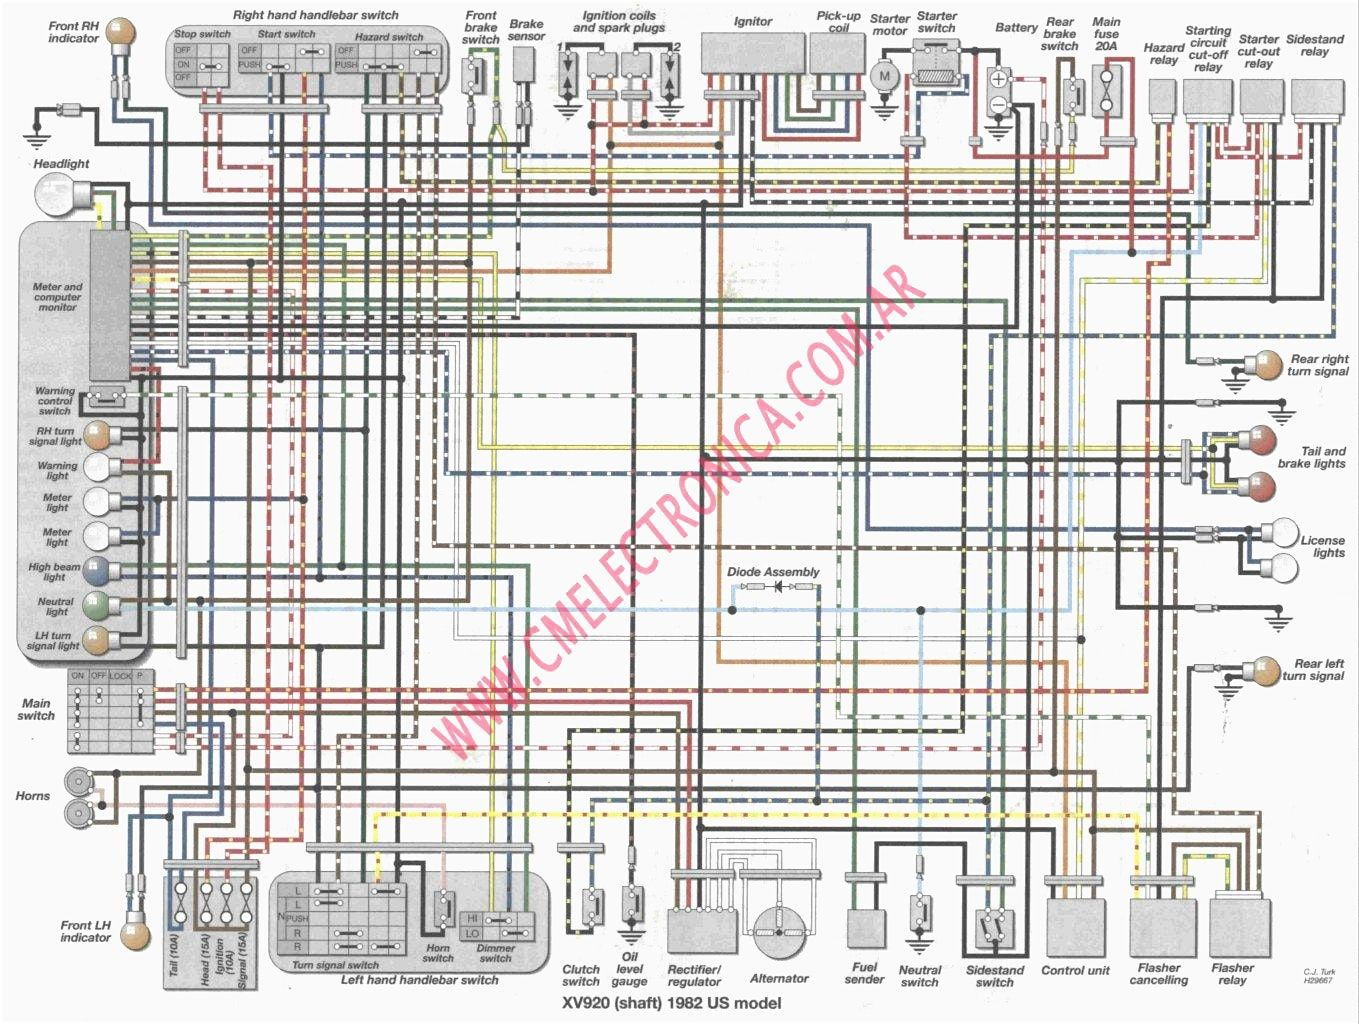 1982 Yamaha Virago 920 Wiring Diagram | hobbiesxstyle